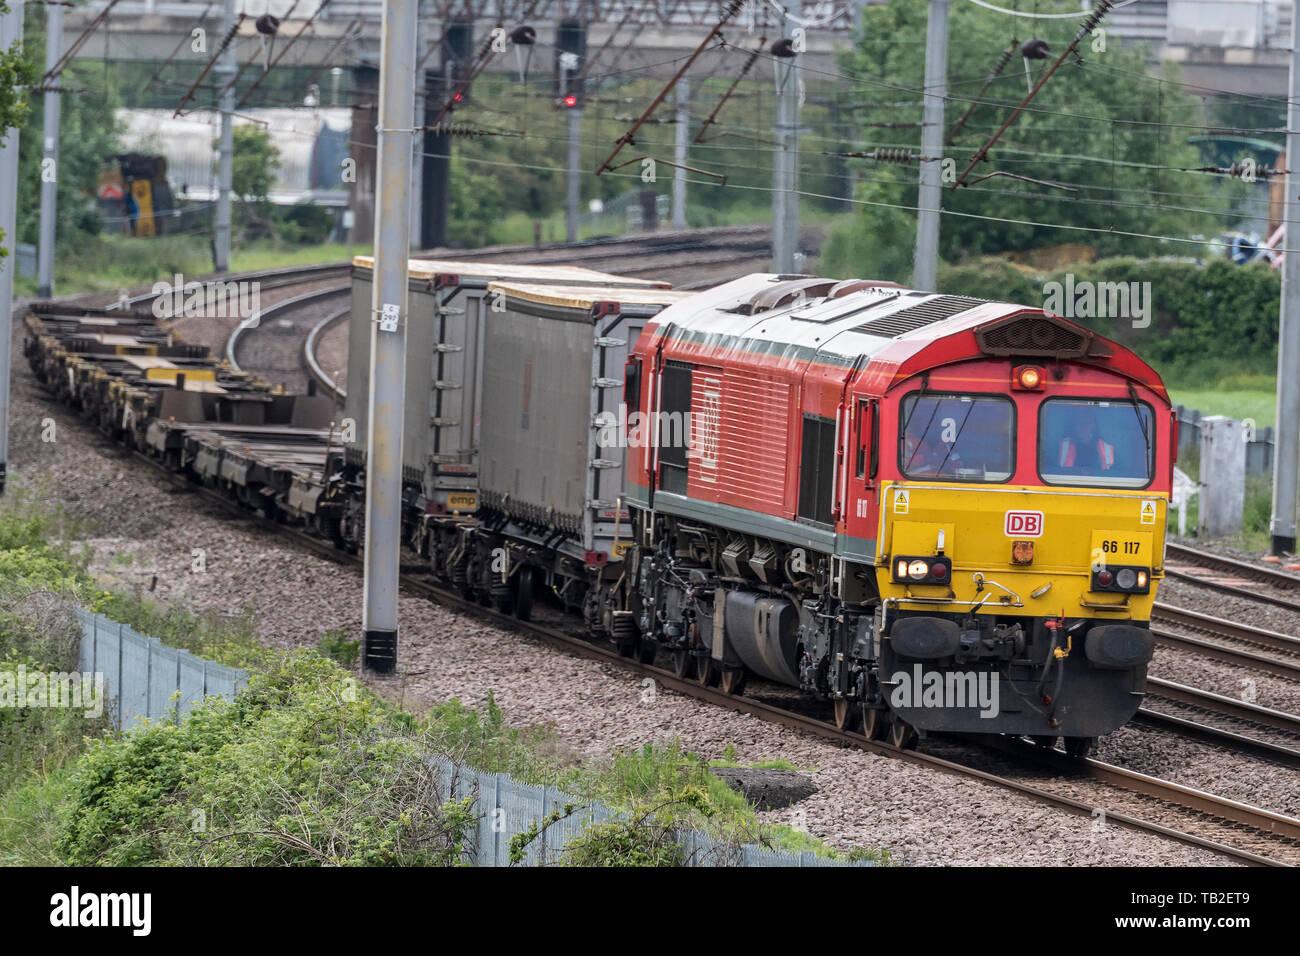 DB Schenker Class 66 diesel freight locomotive at Winwick. - Stock Image